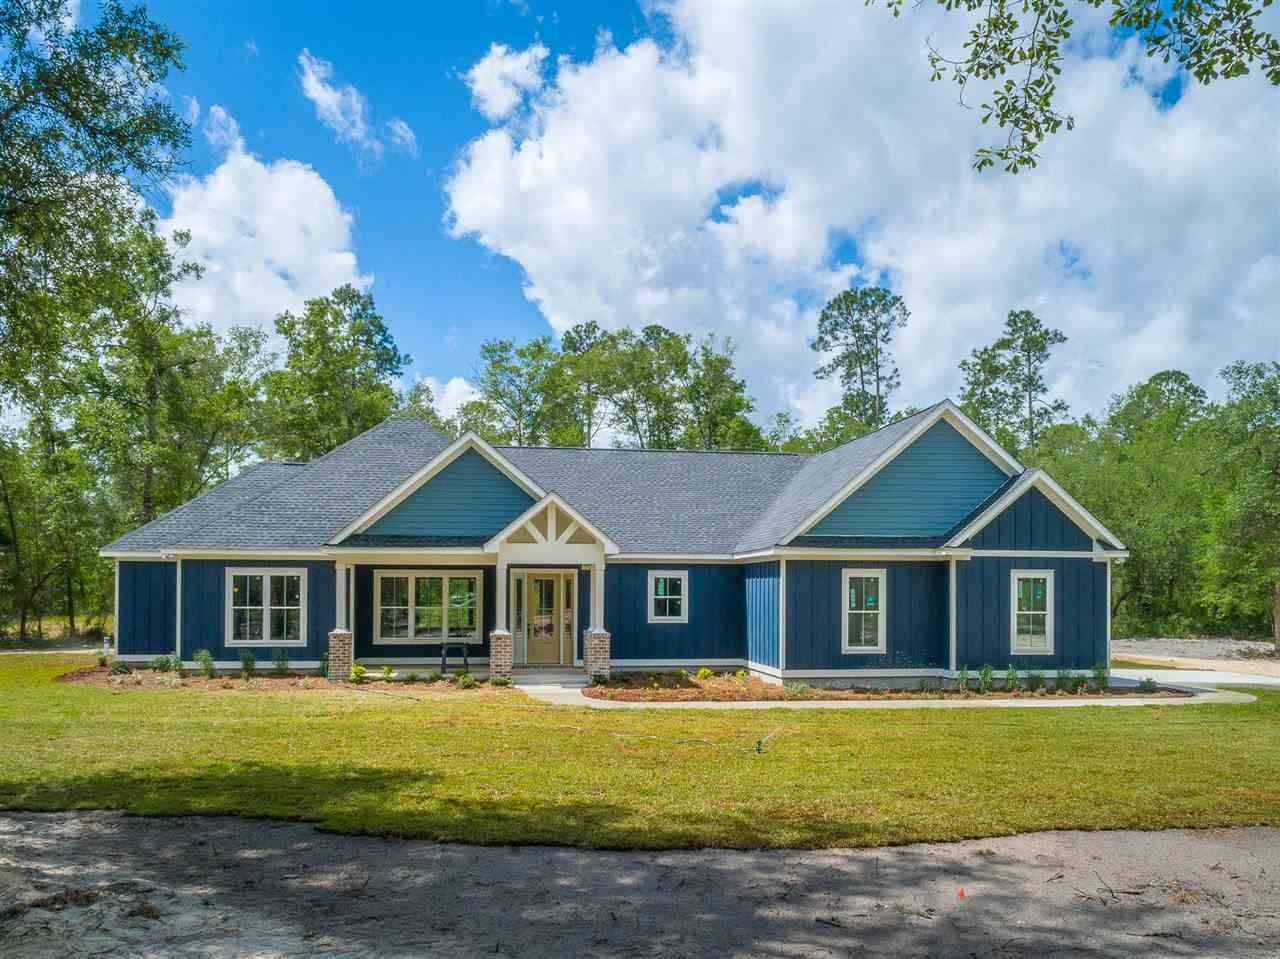 4745 Bloxham Cutoff Road, Crawfordville, FL 32327 - MLS#: 315585